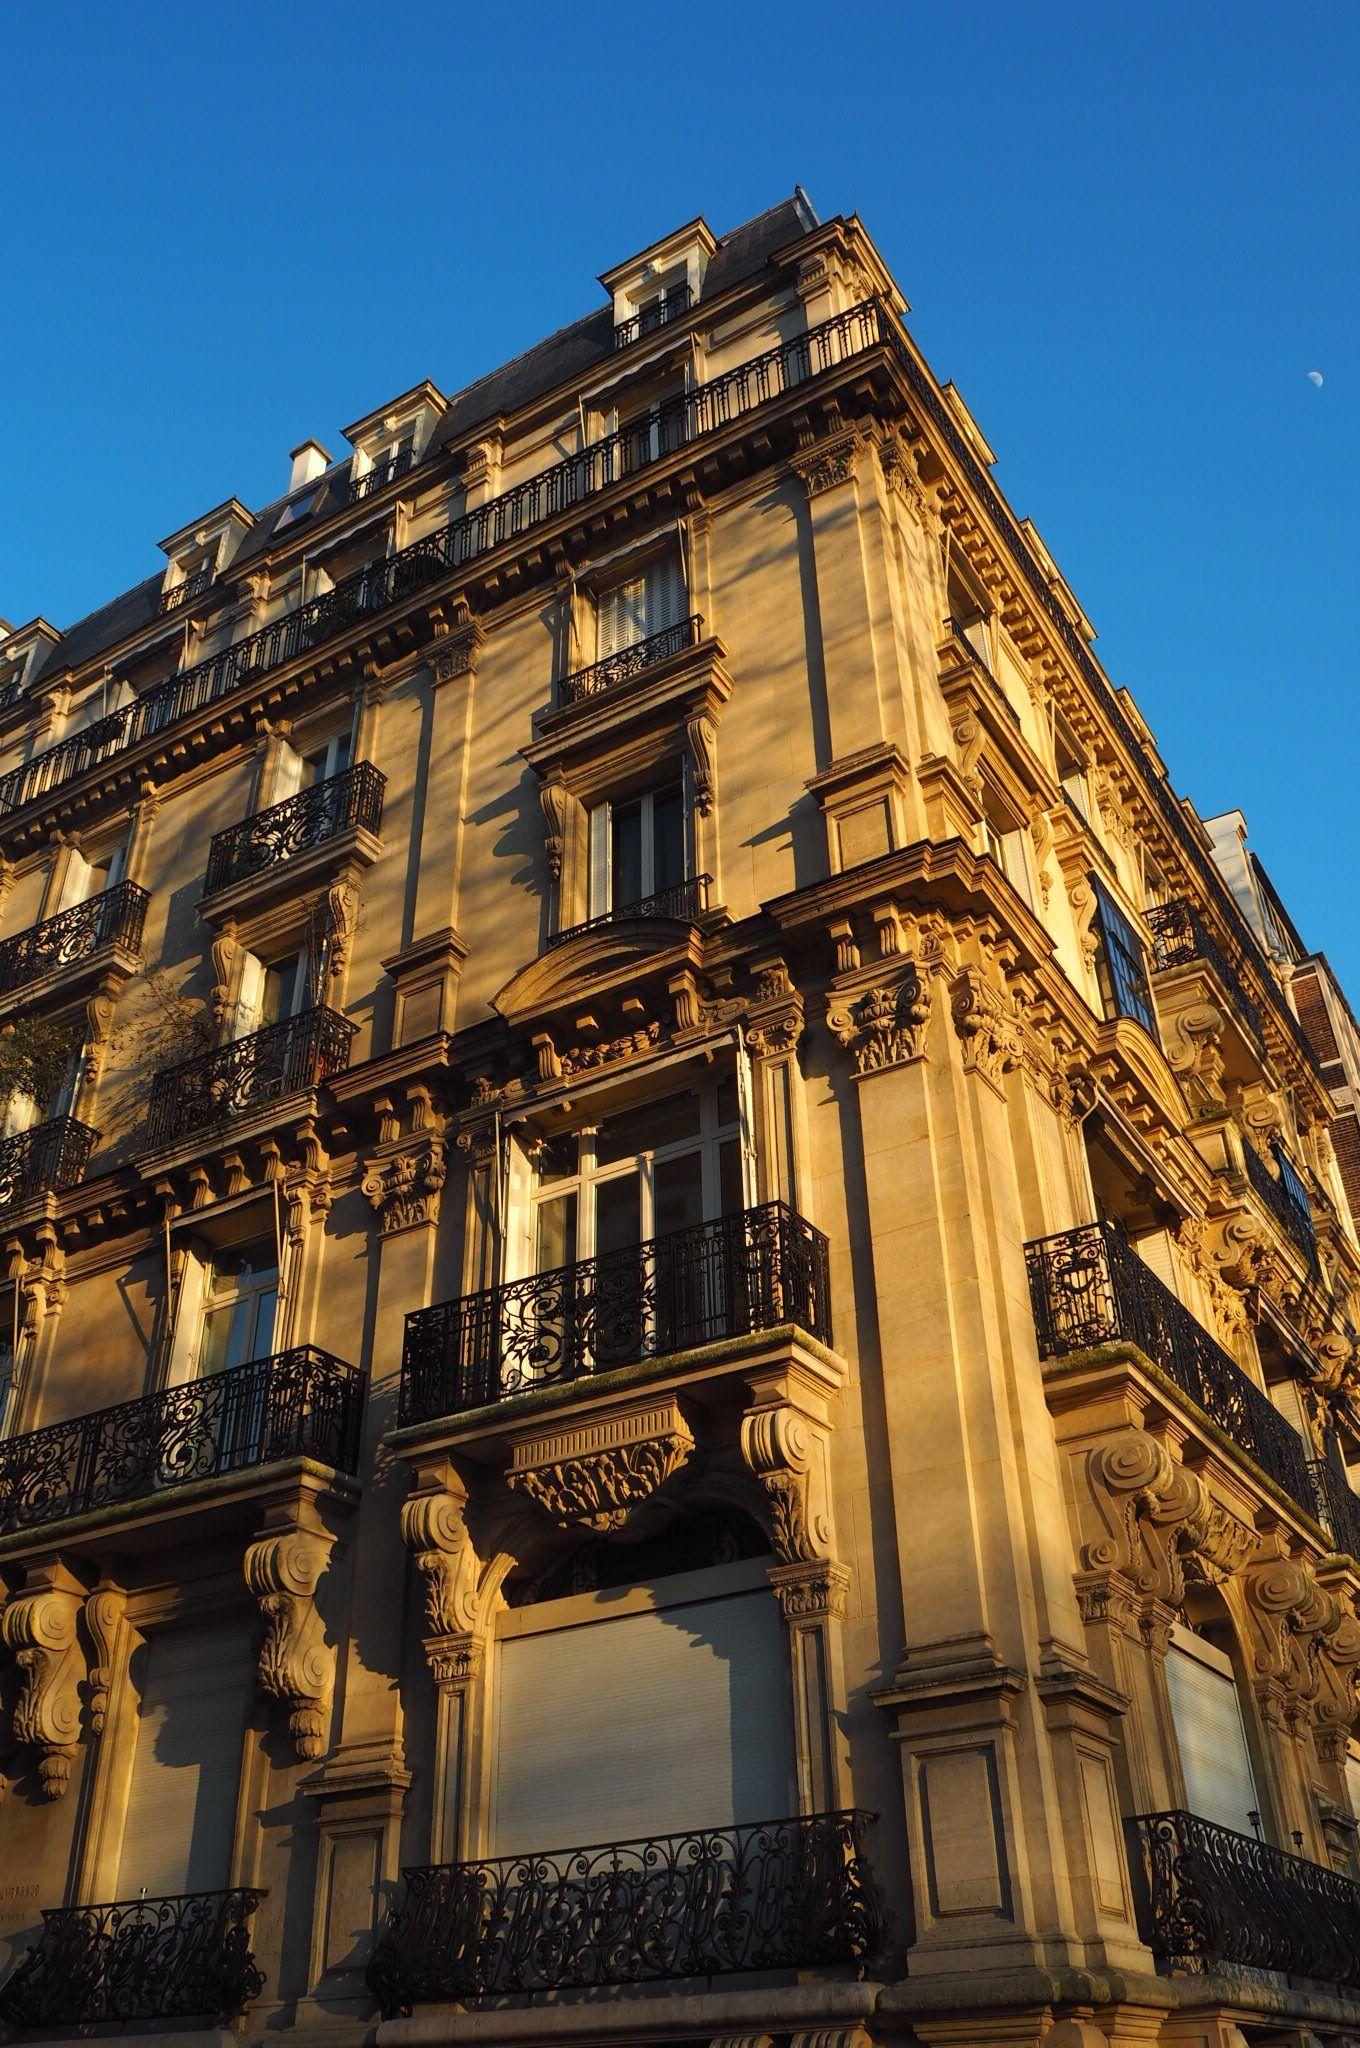 Beautiful architecture in Paris at sunset